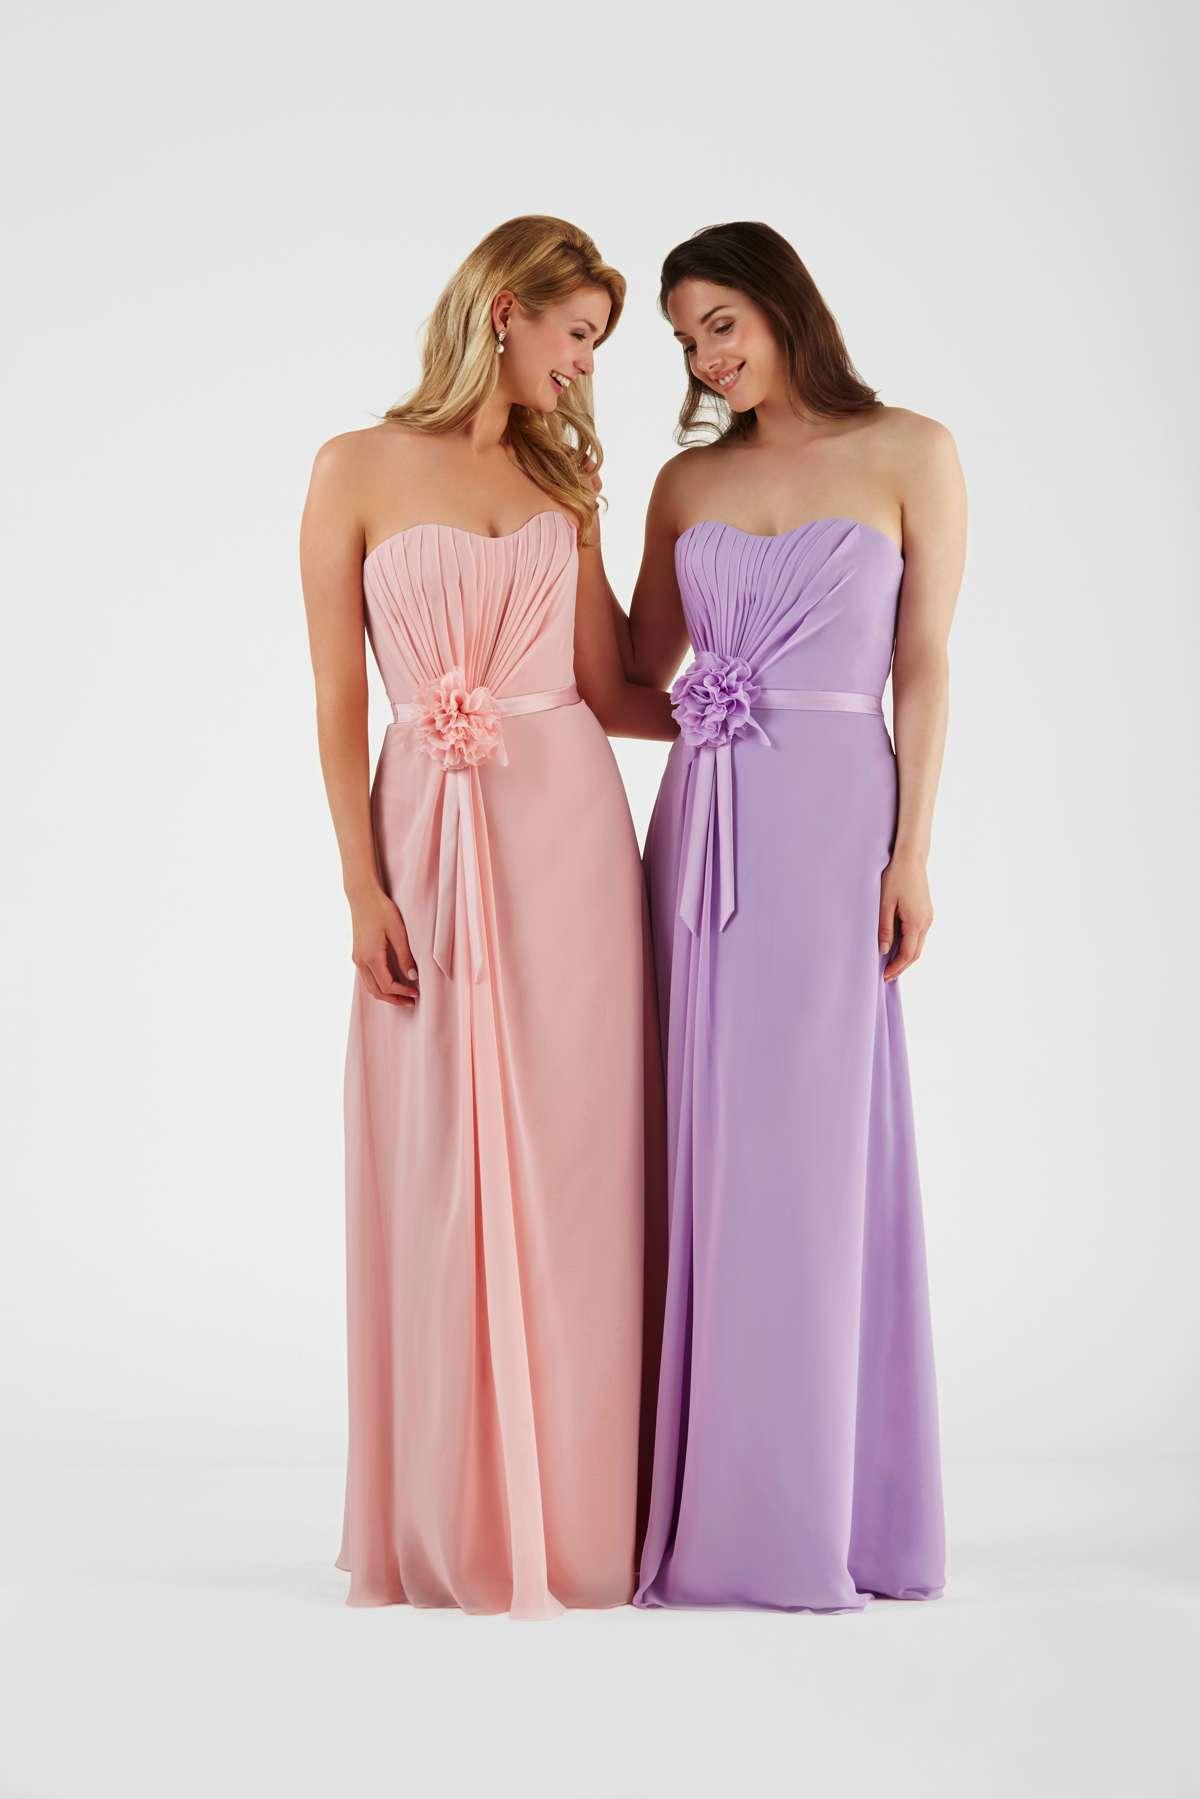 Beautiful bridesmaid gowns from EbonyRose Designs - Love ...